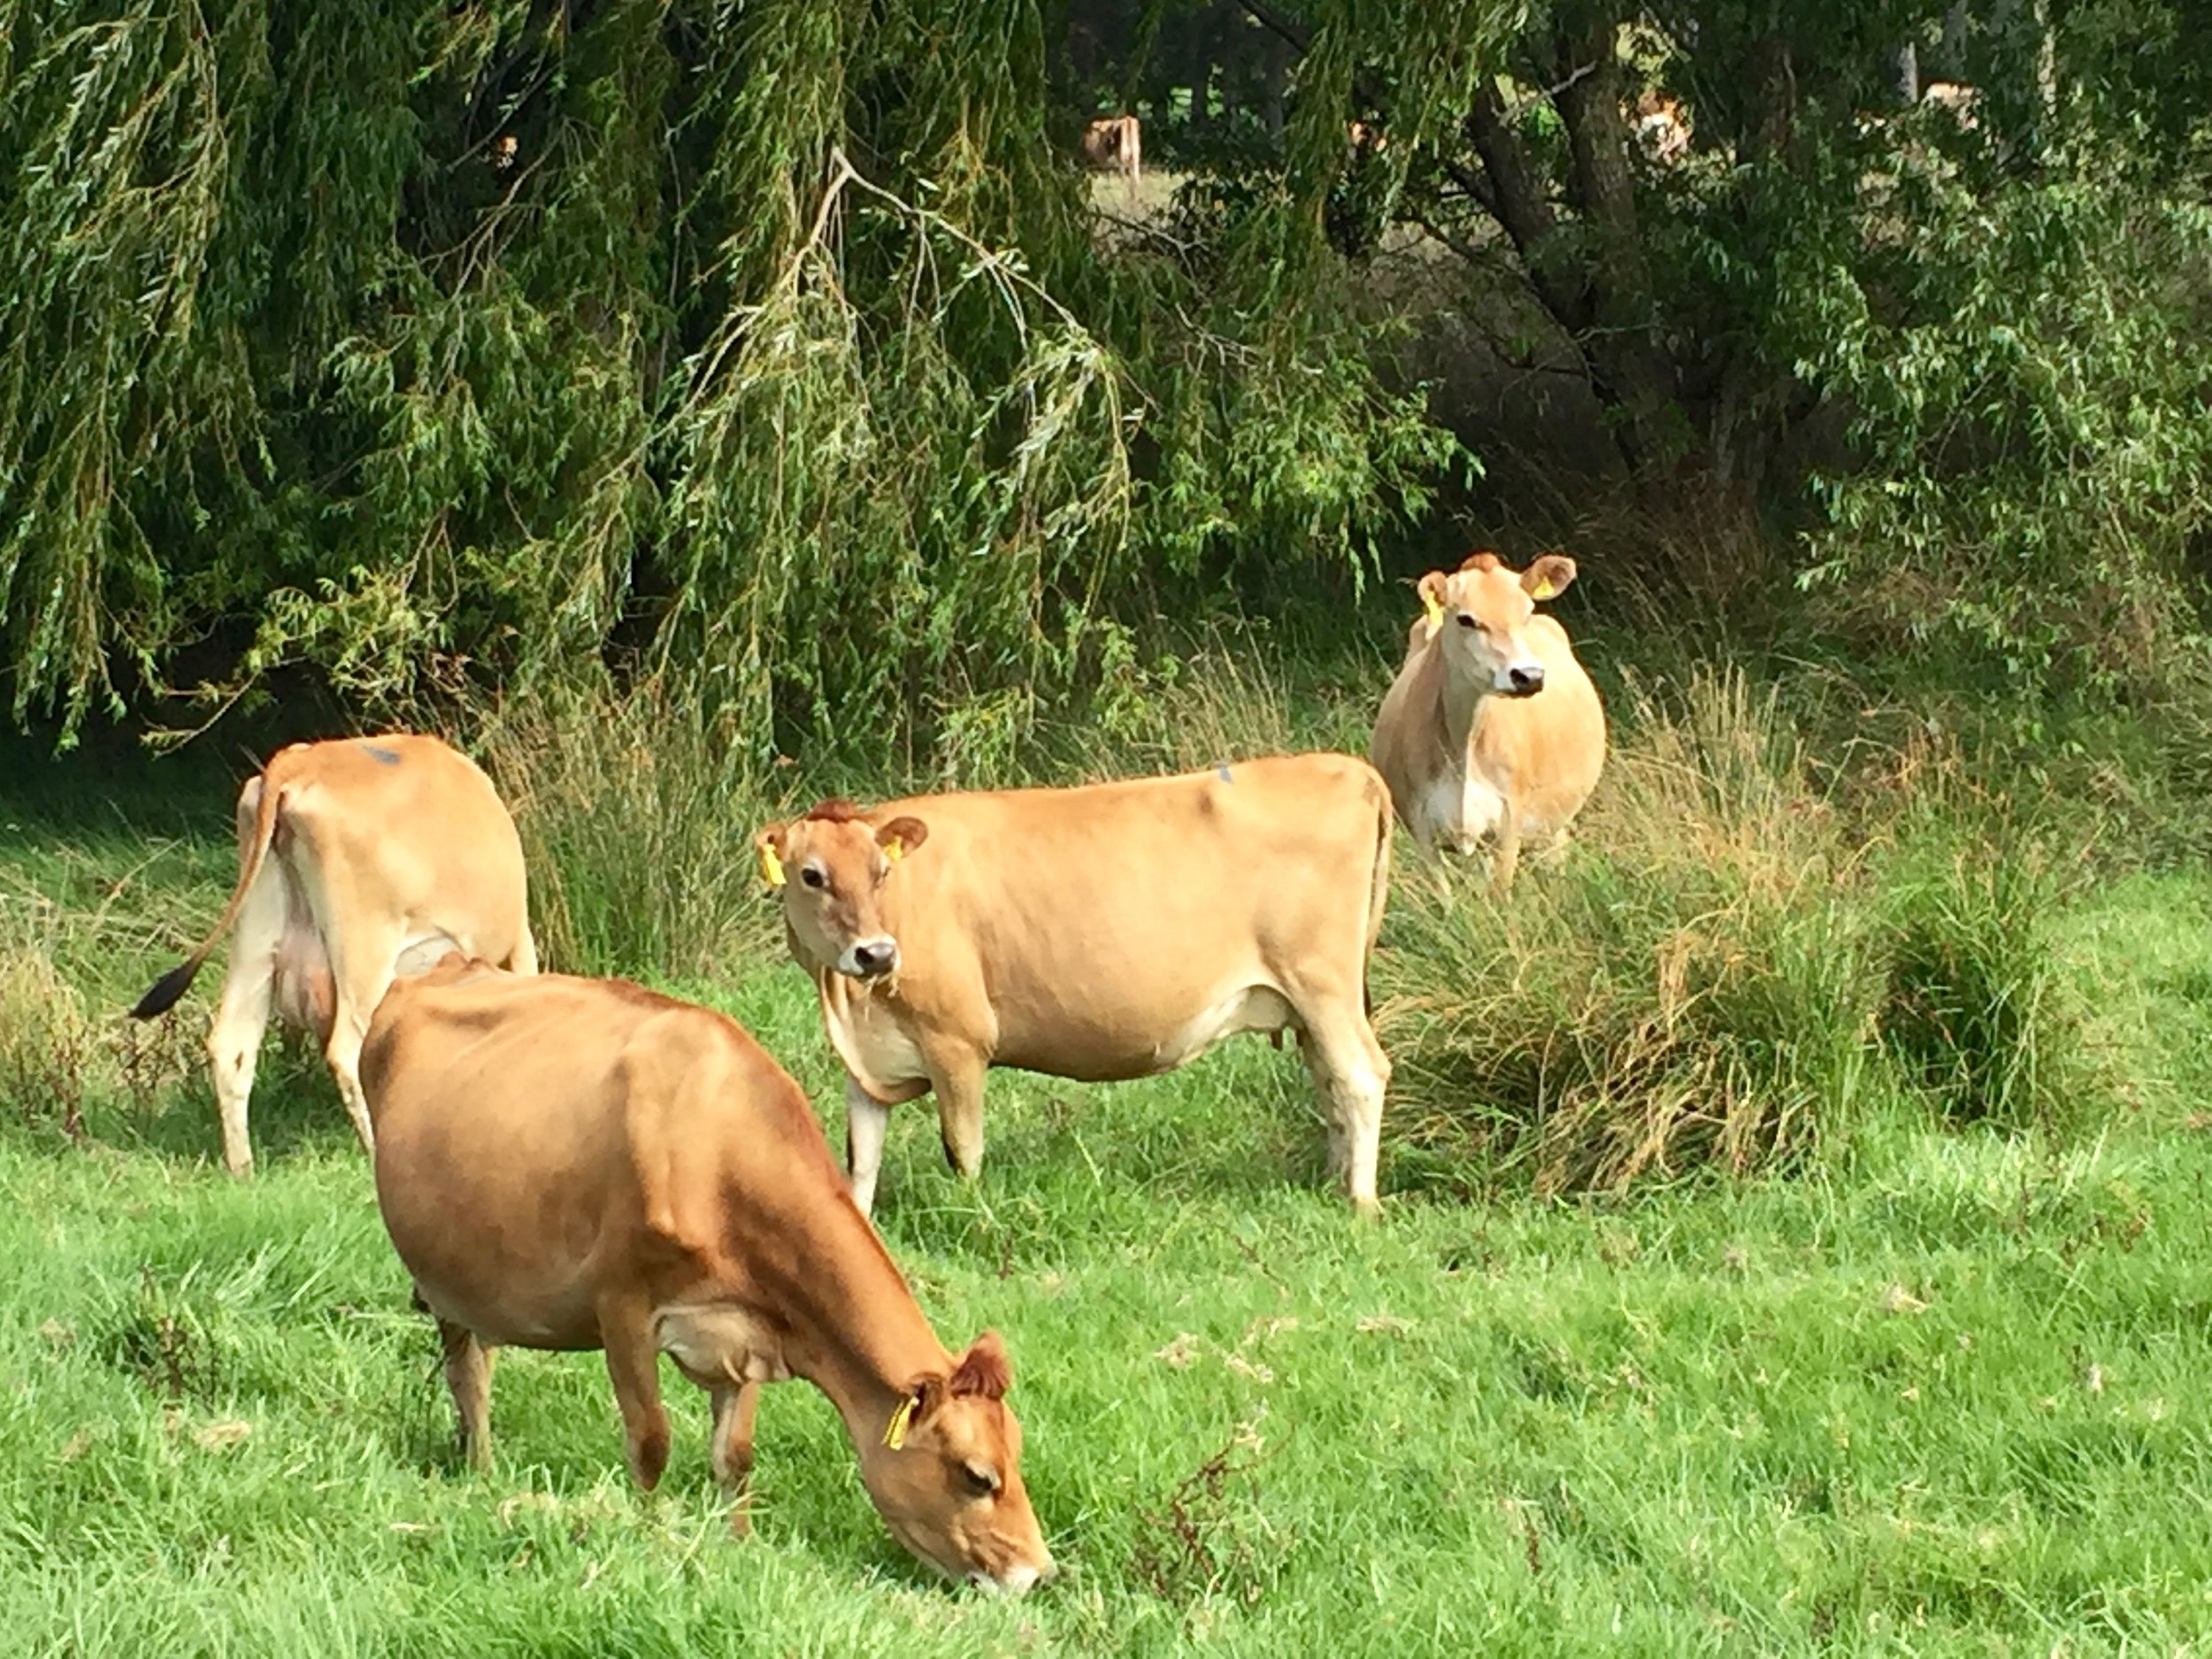 cows_eating.jpeg